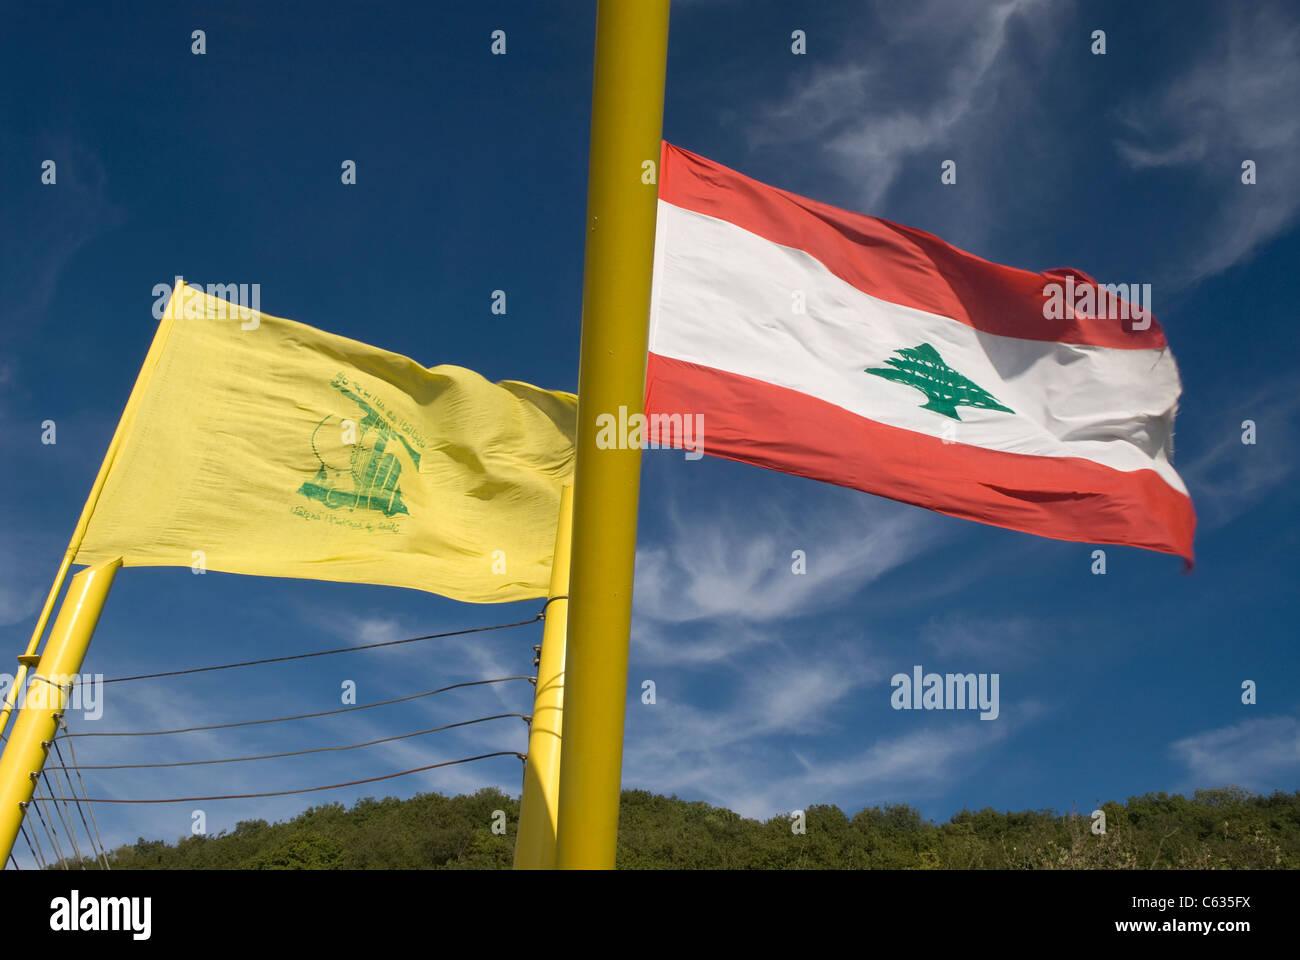 Hezbollah and Lebanese national flag (right) flying over Mleeta, southern Lebanon. - Stock Image